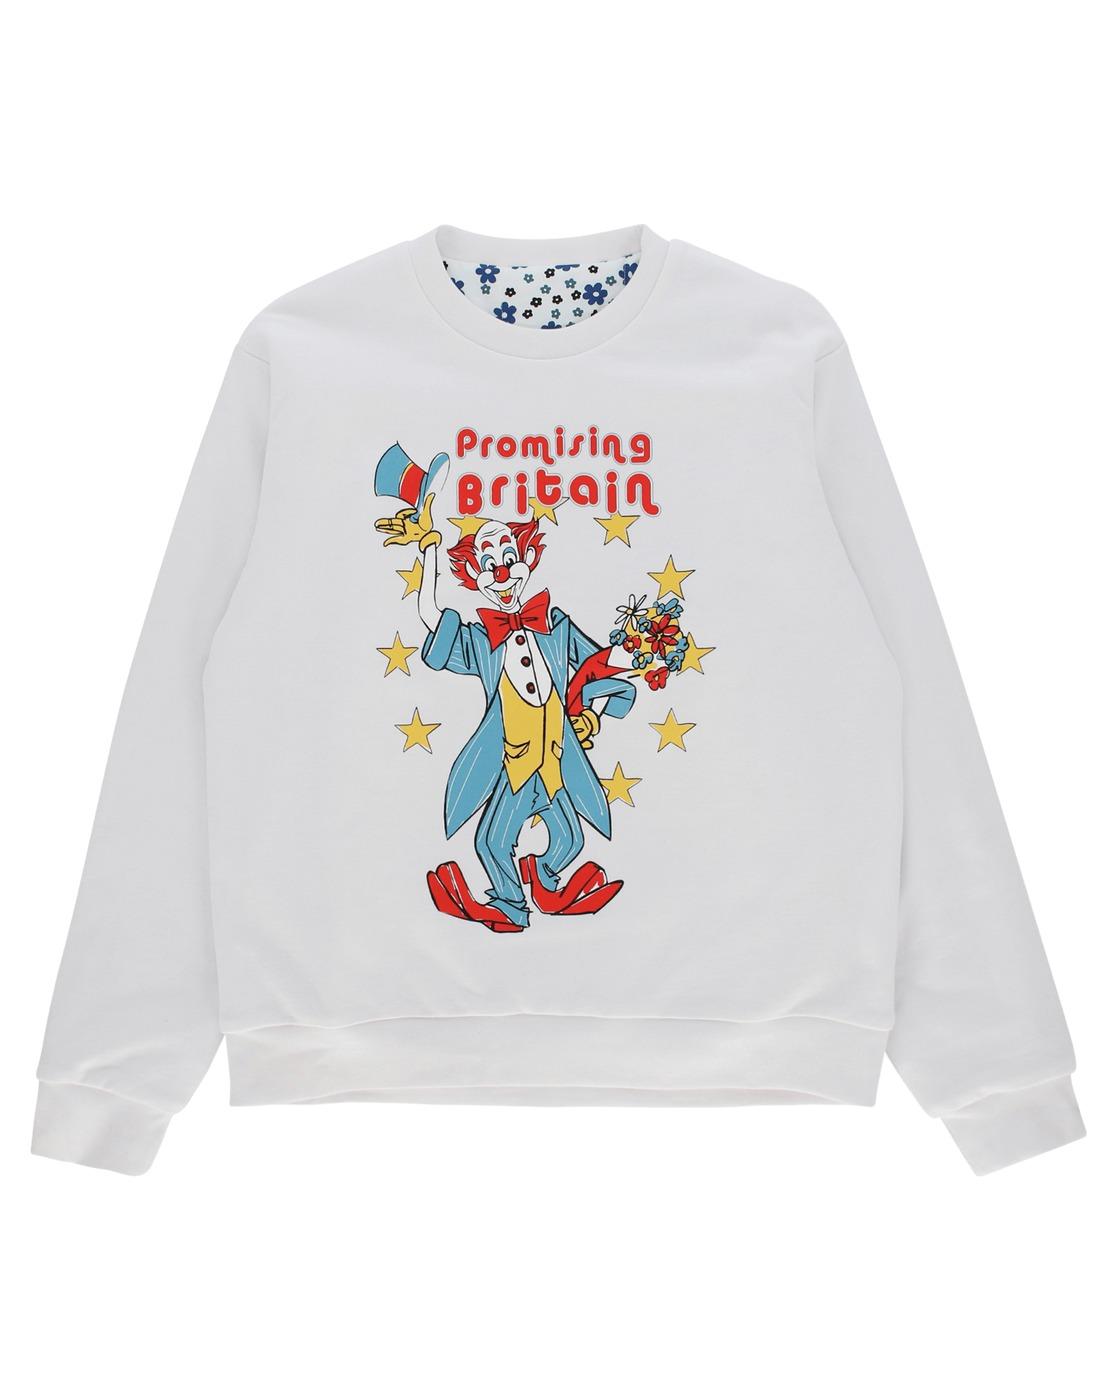 Martine Rose Reversible Clown Artwork Crewneck Sweatshirt White